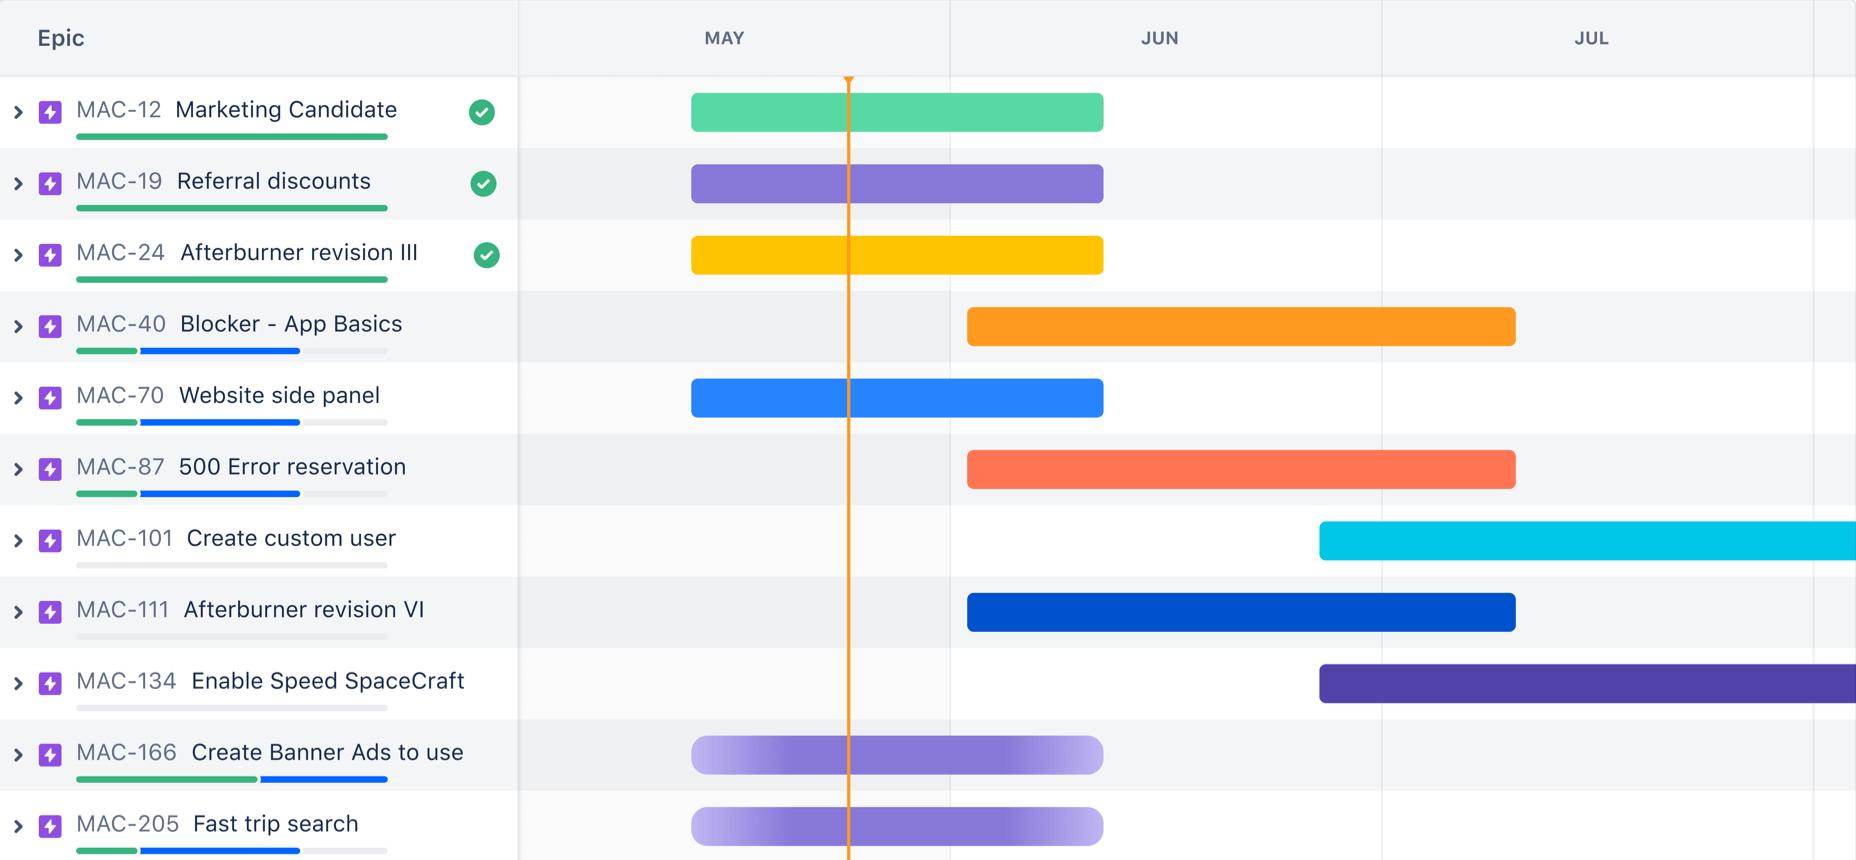 A screenshot of a project-specific Gantt chart | Atlassian Agile Coach